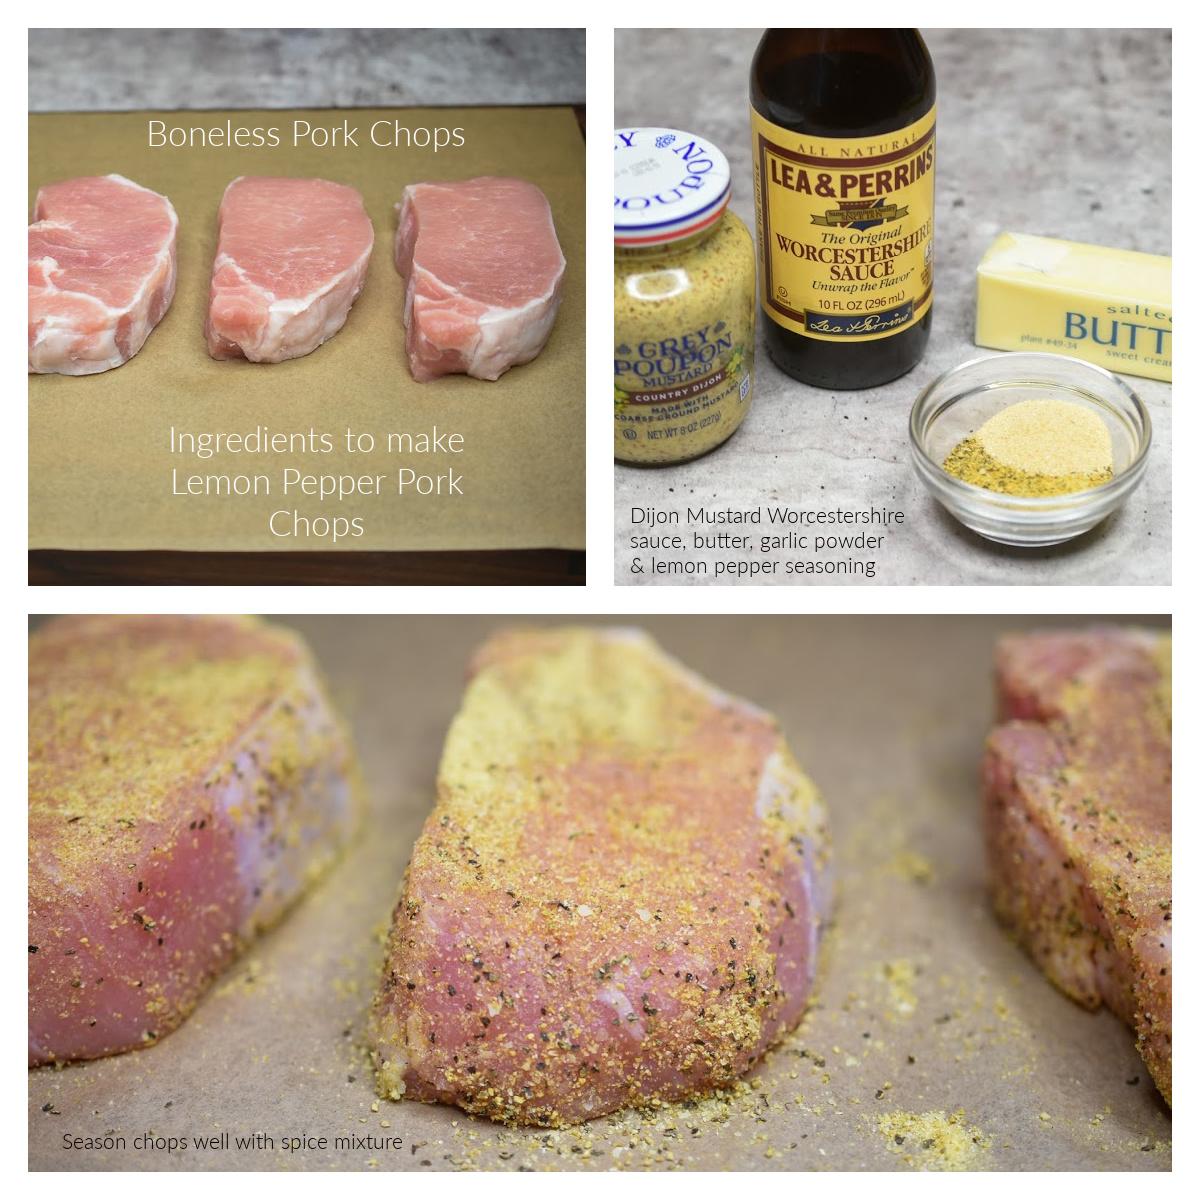 Ingredients to make Lemon Pepper Pork Chops